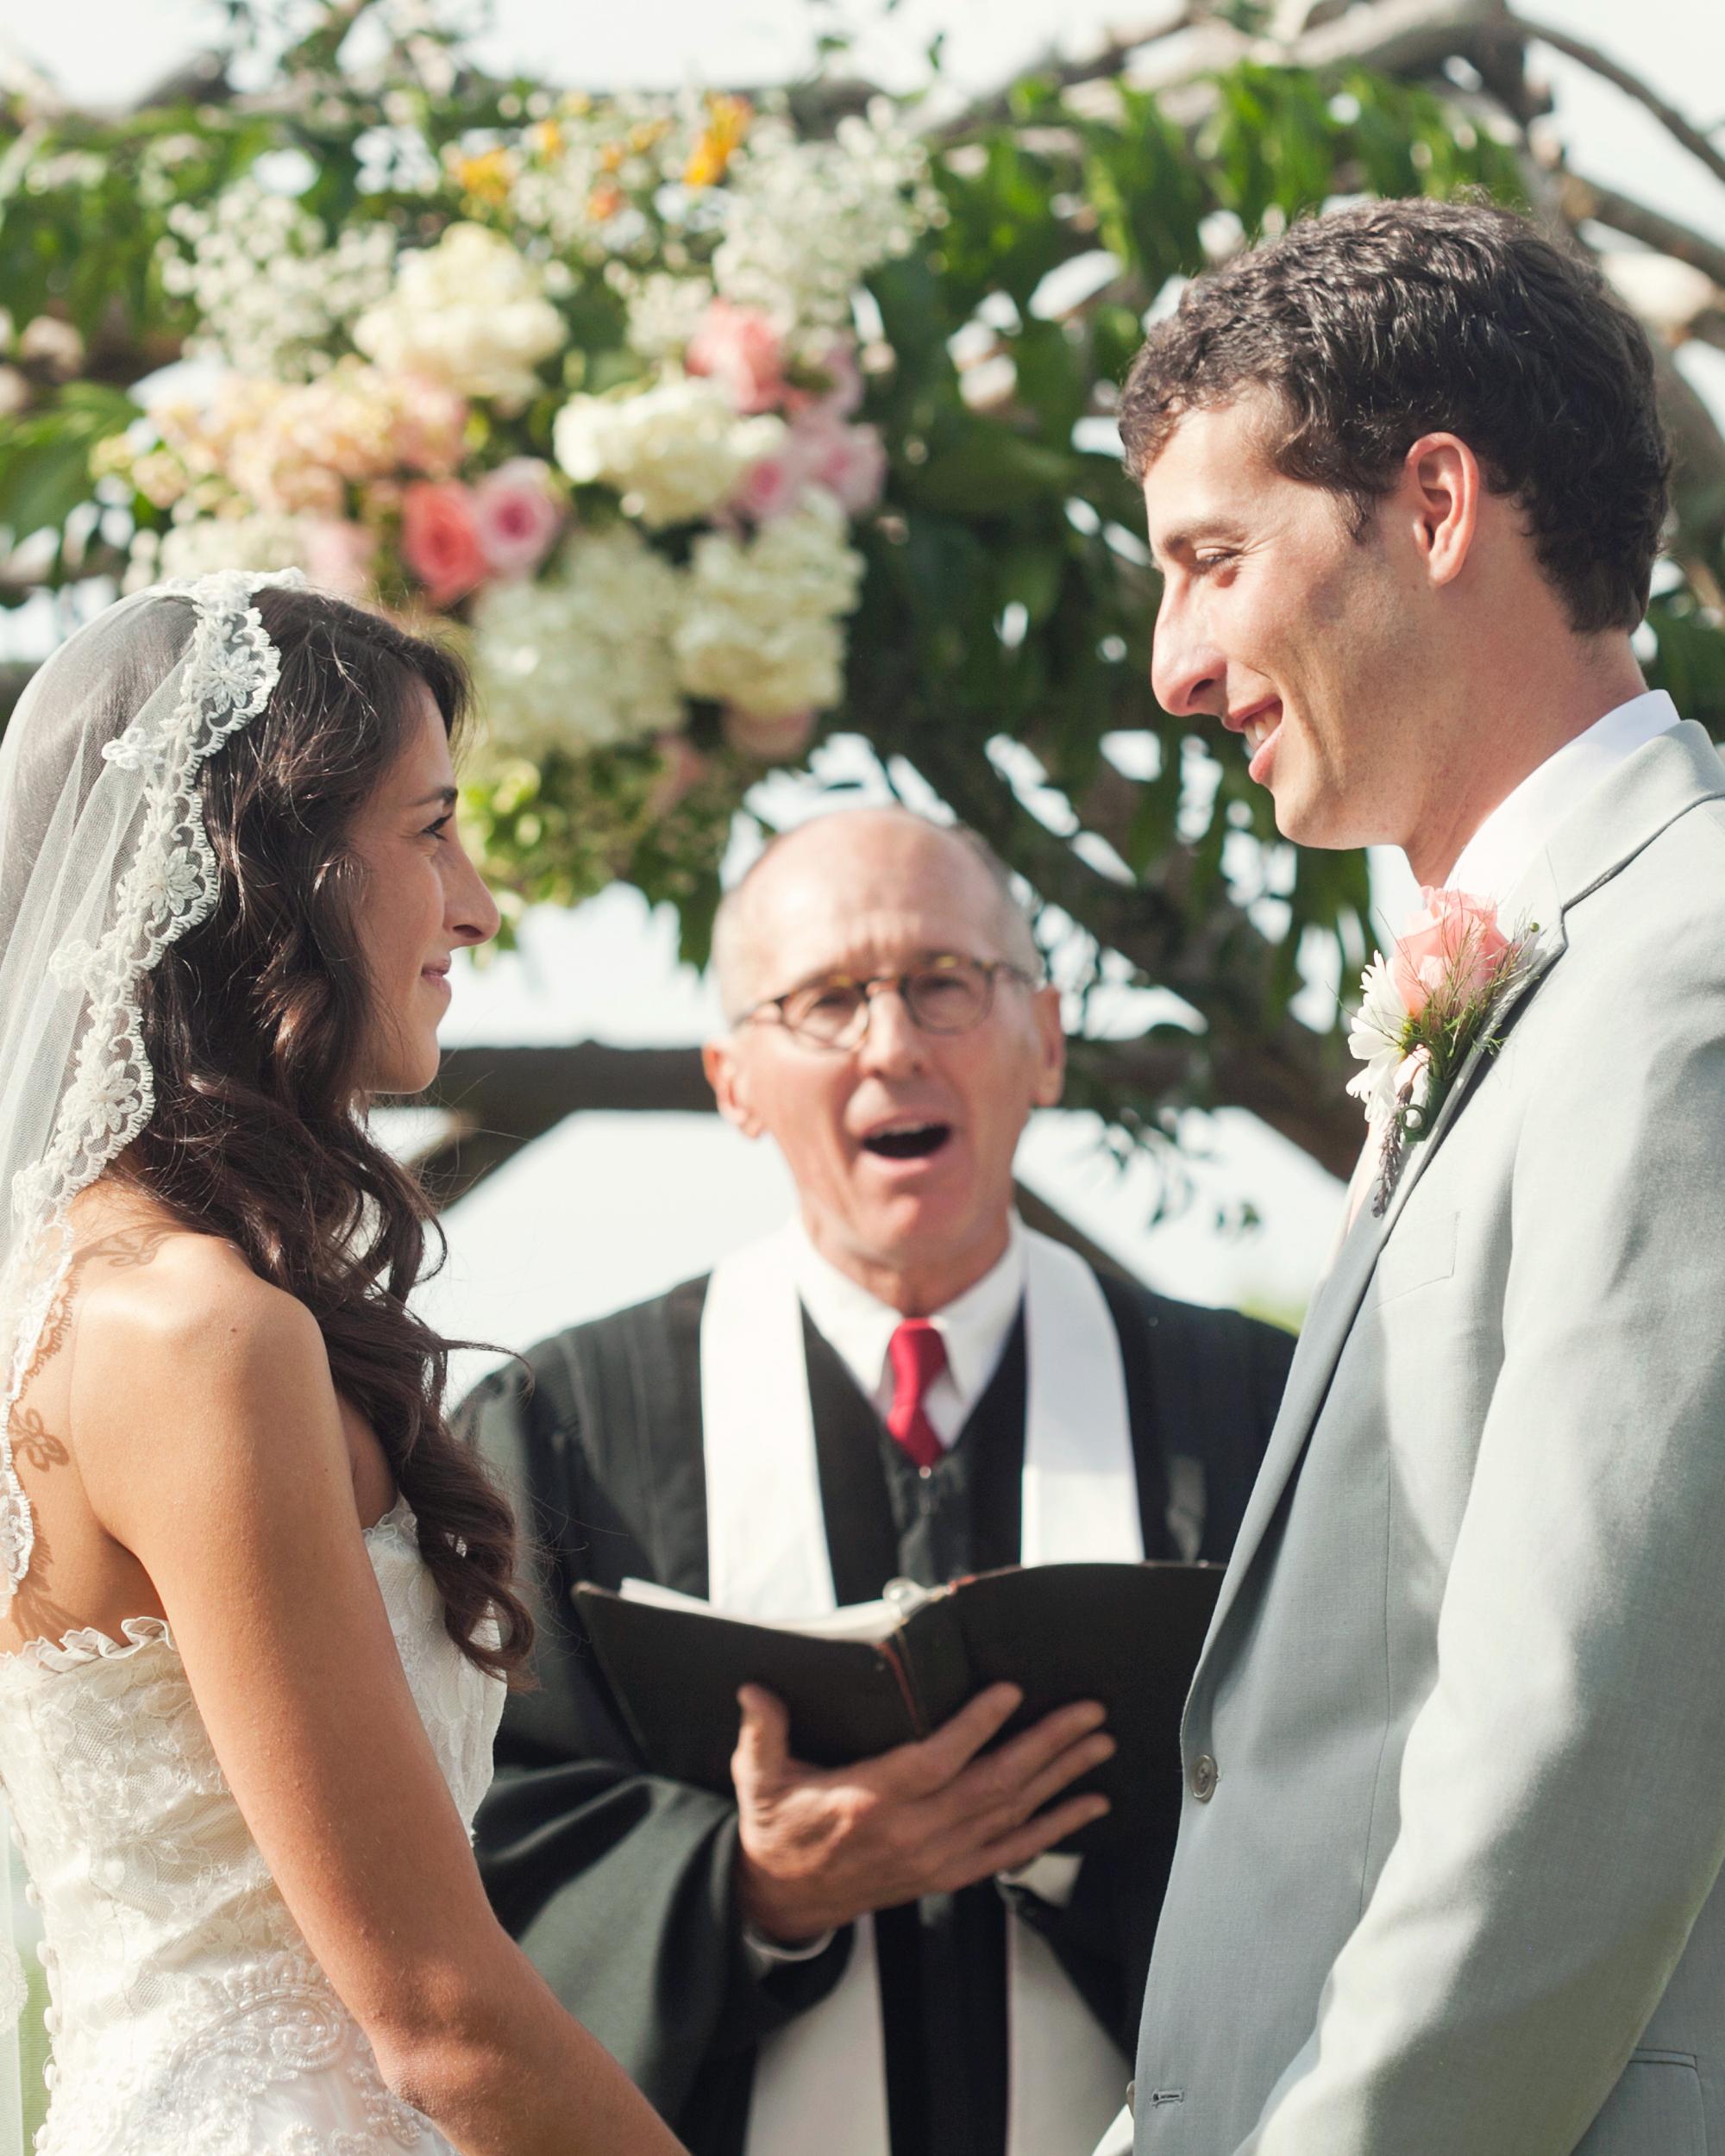 real-weddings-abby-julian-0711-305.jpg